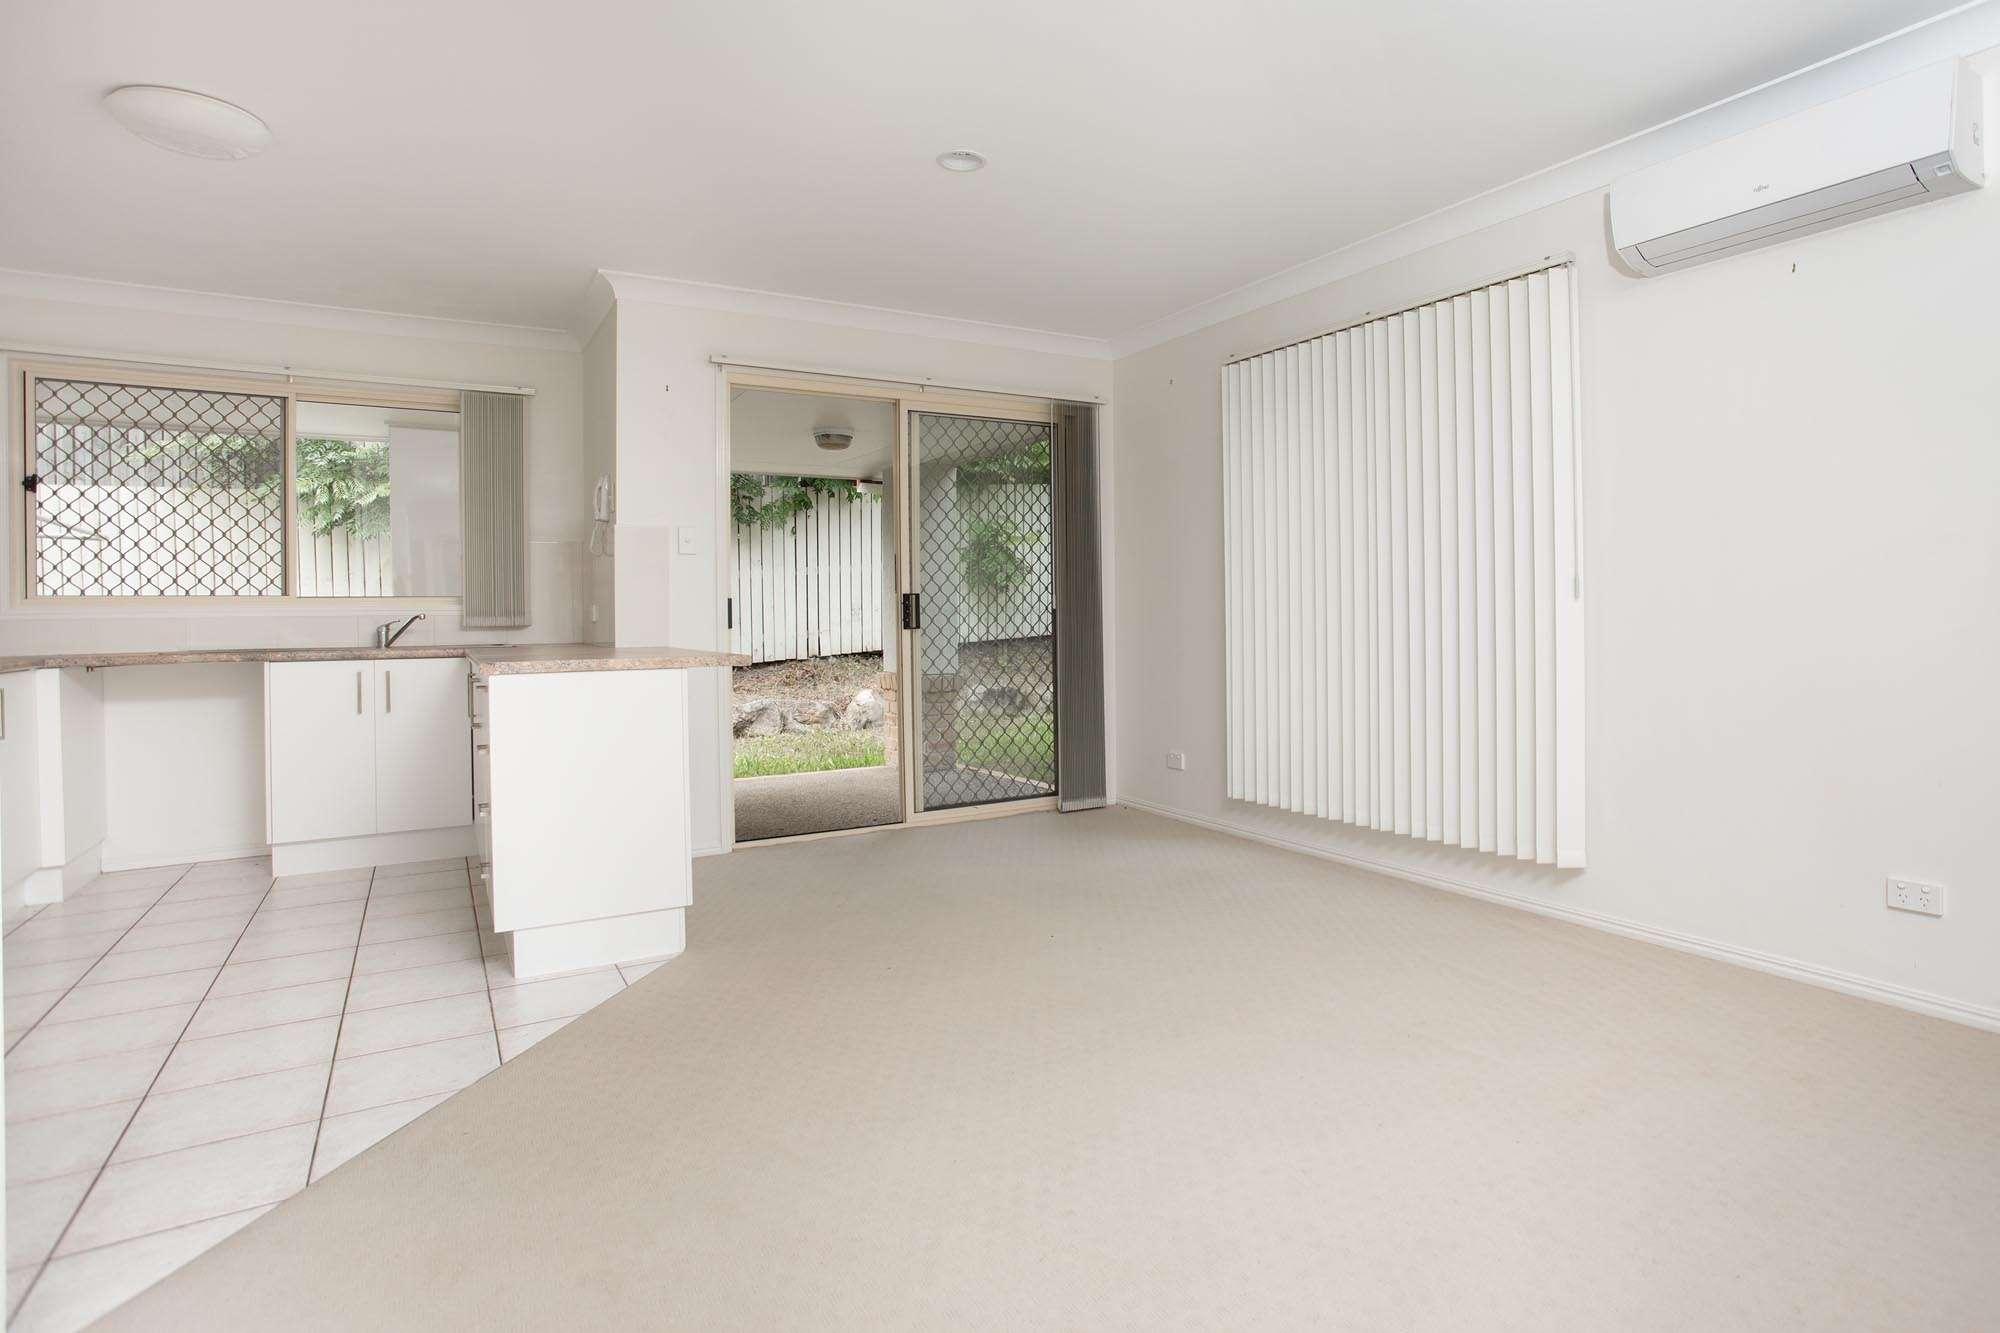 9/241 Horizon Drive, Westlake, QLD 4074